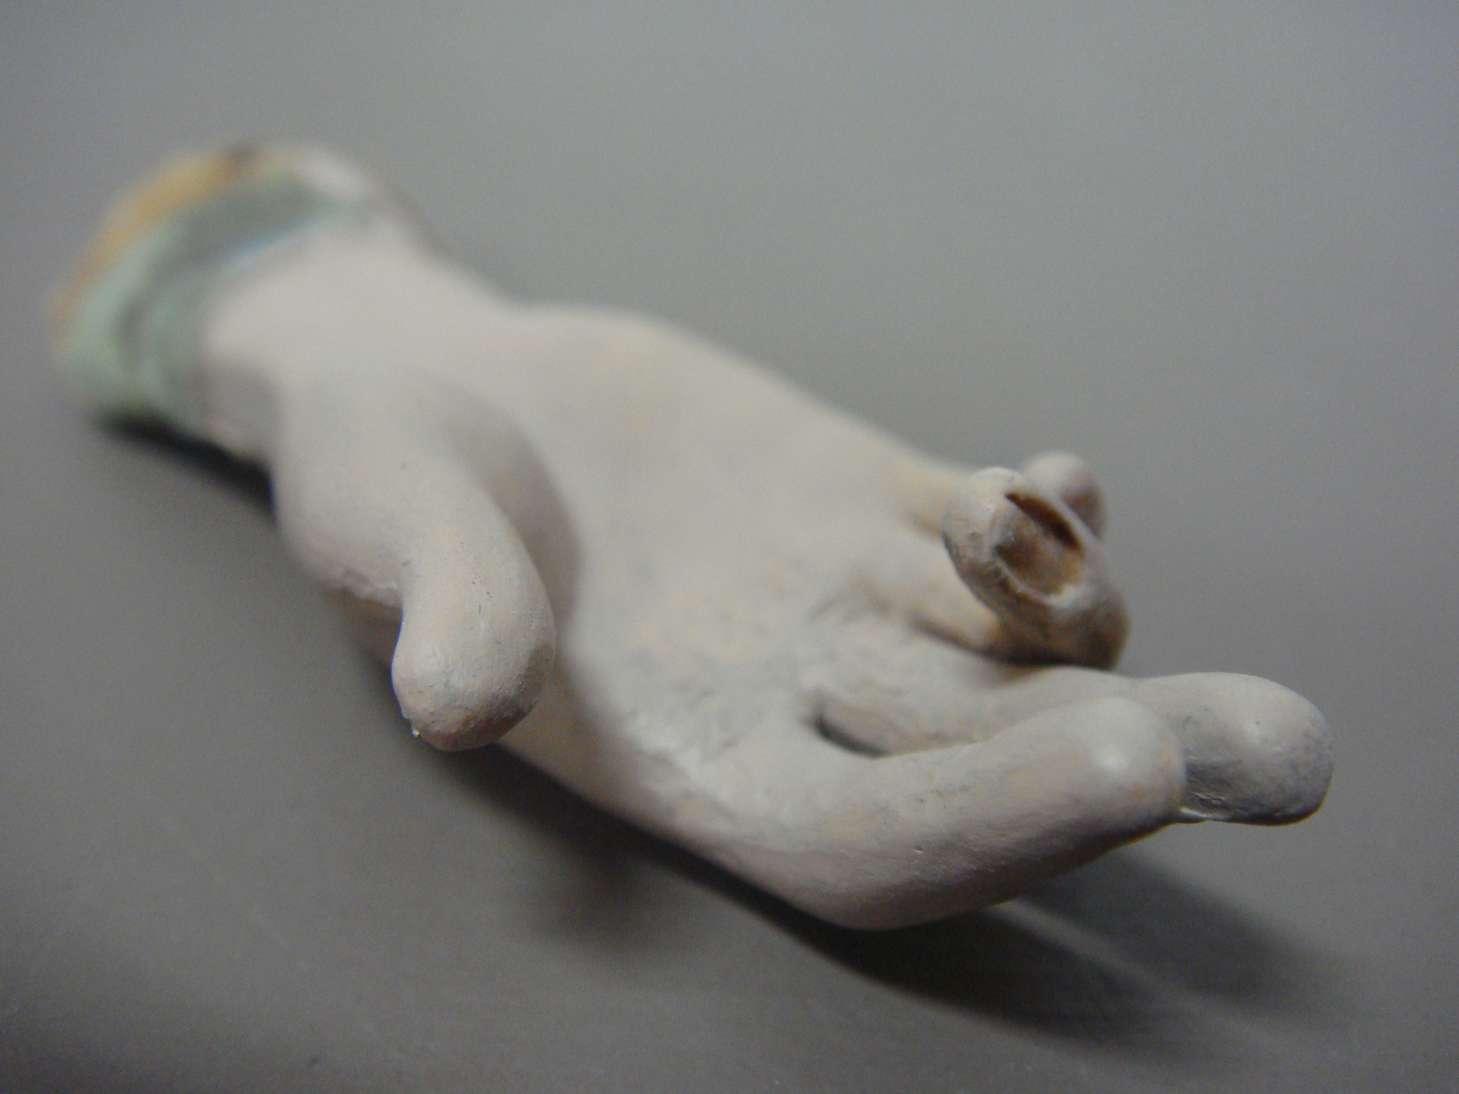 cire-enfant-louis-XV-saint-nicolas-tableau-scene-art-ancien-restauration-restaurarte-main.jpg